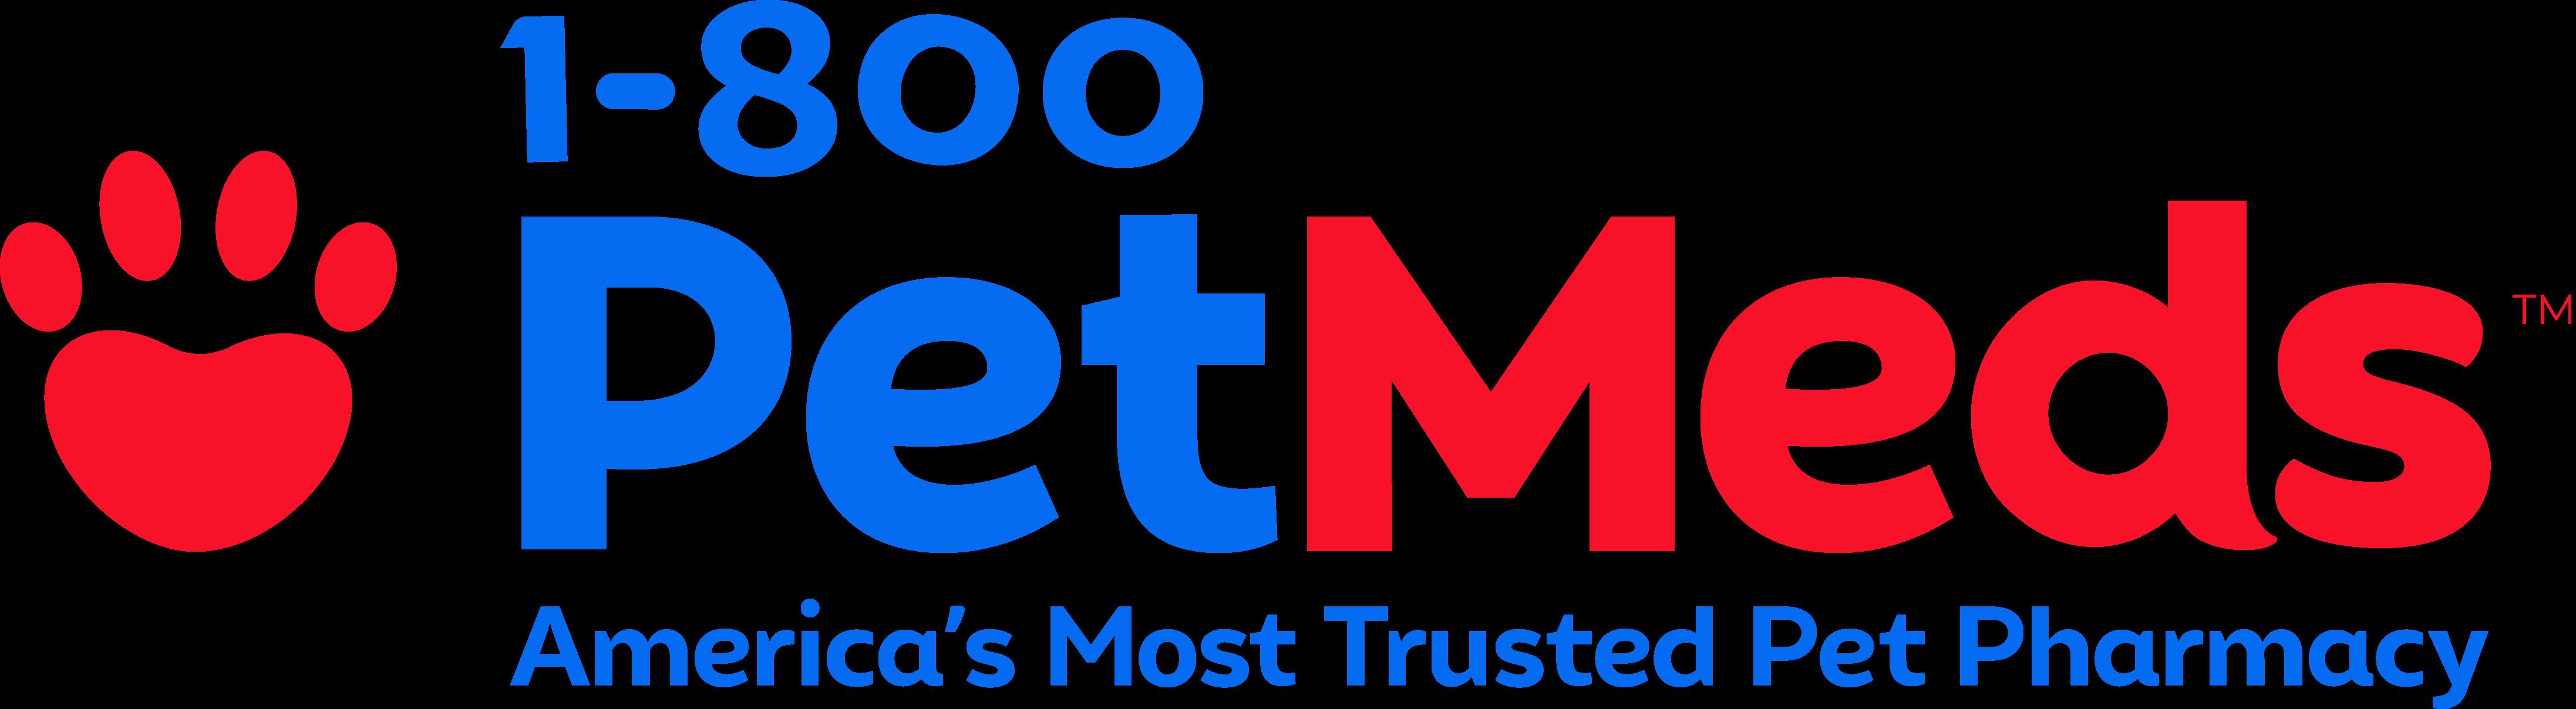 1-800-PetMeds promo codes